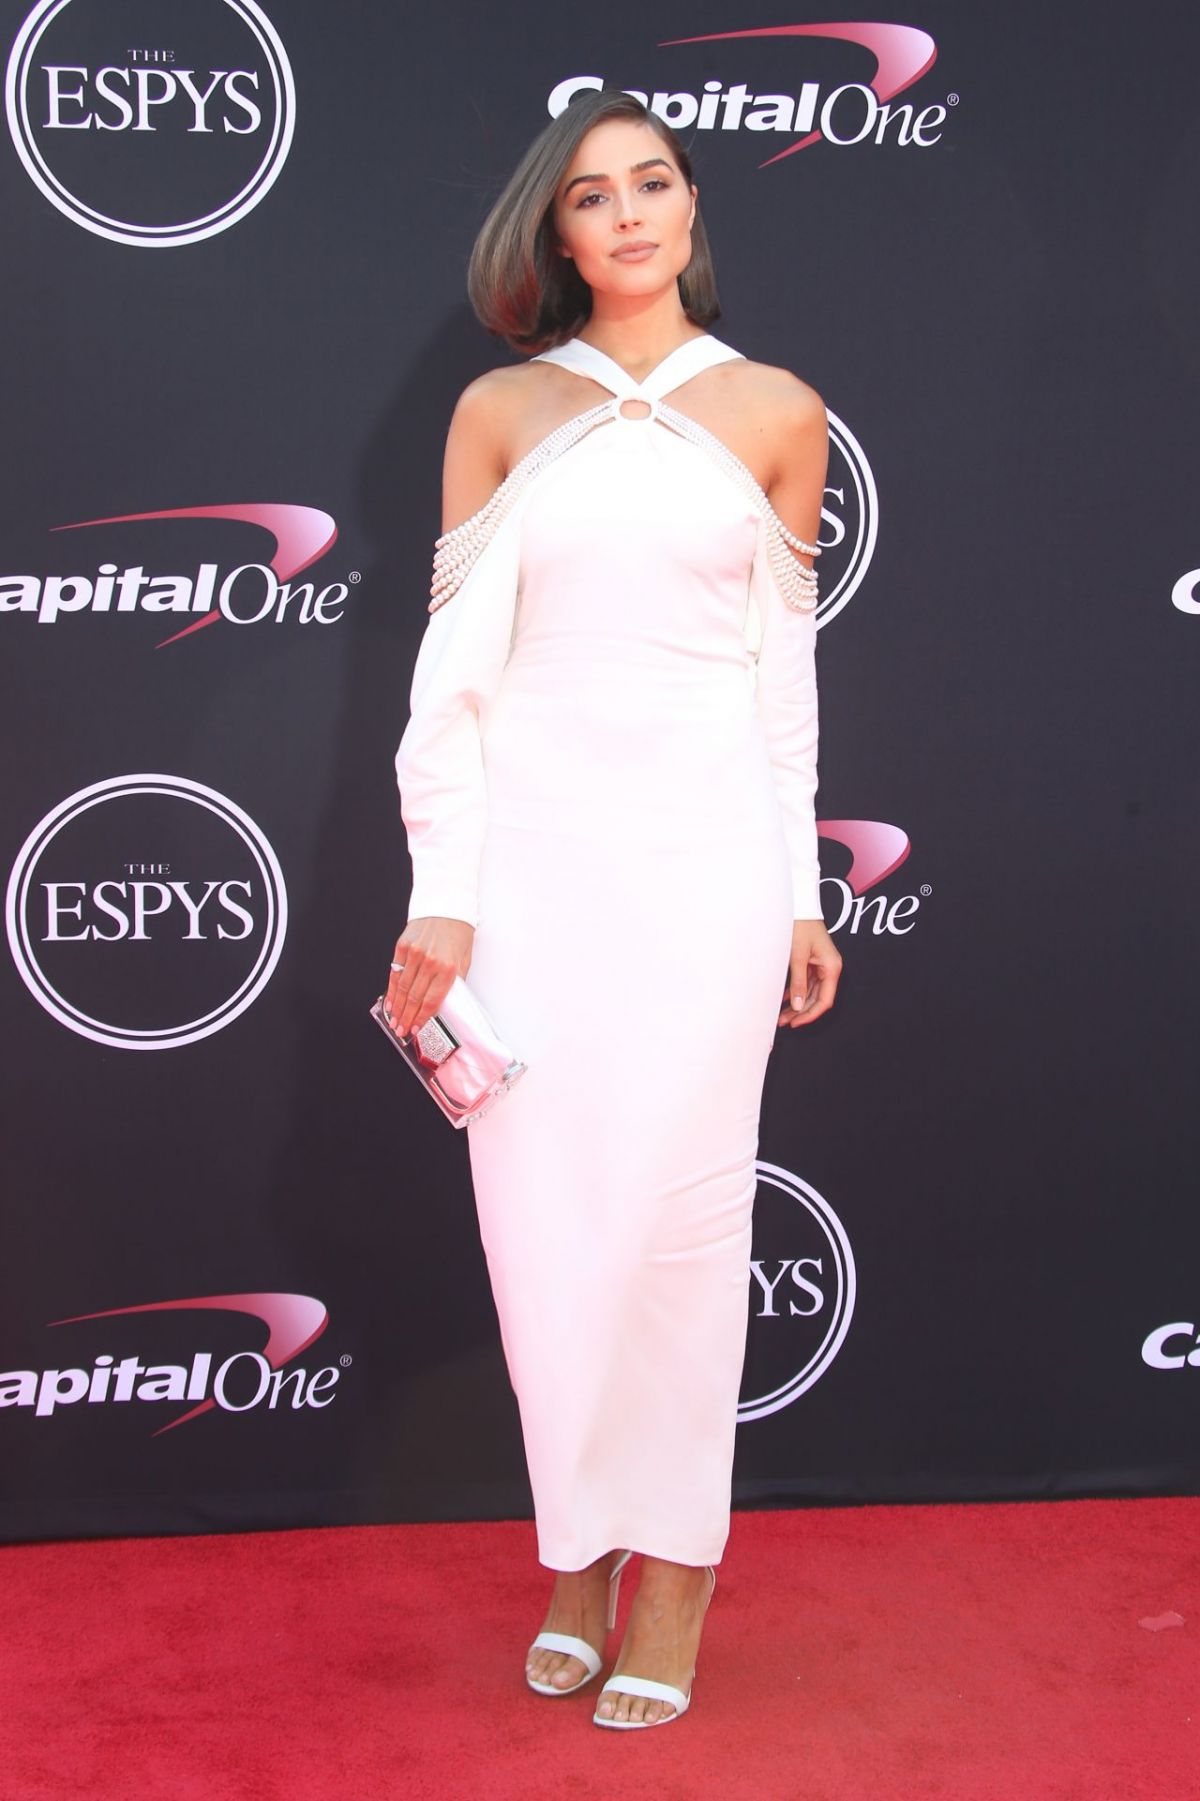 OLIVA CULPO at Espy Awards 2017 in Los Angeles 07/12/2017